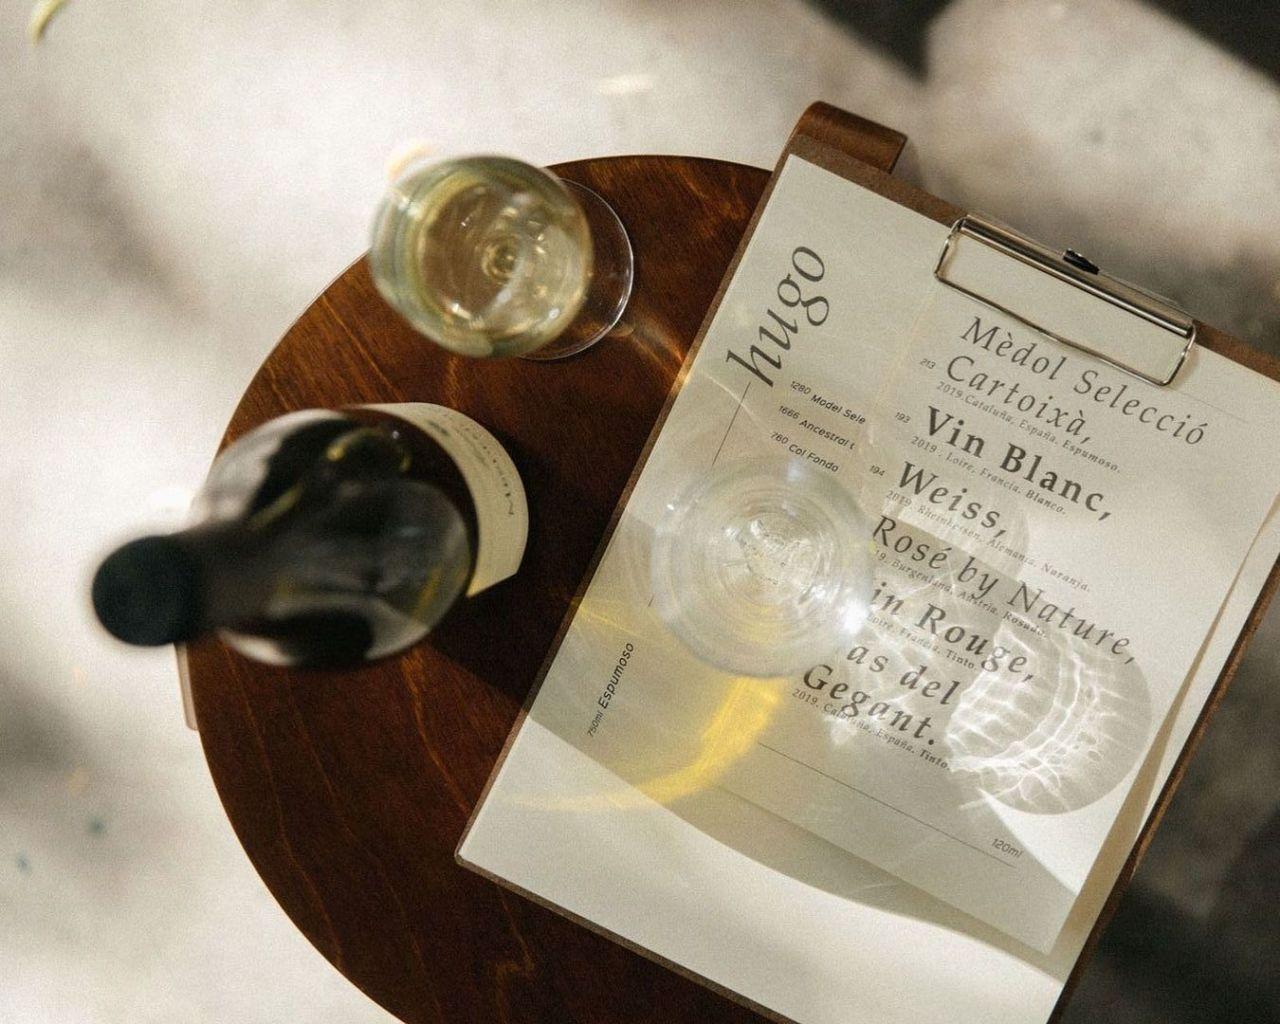 Hugo: El nuevo Wine Bar de Café Milou para disfrutar de un menú francés al aire libre